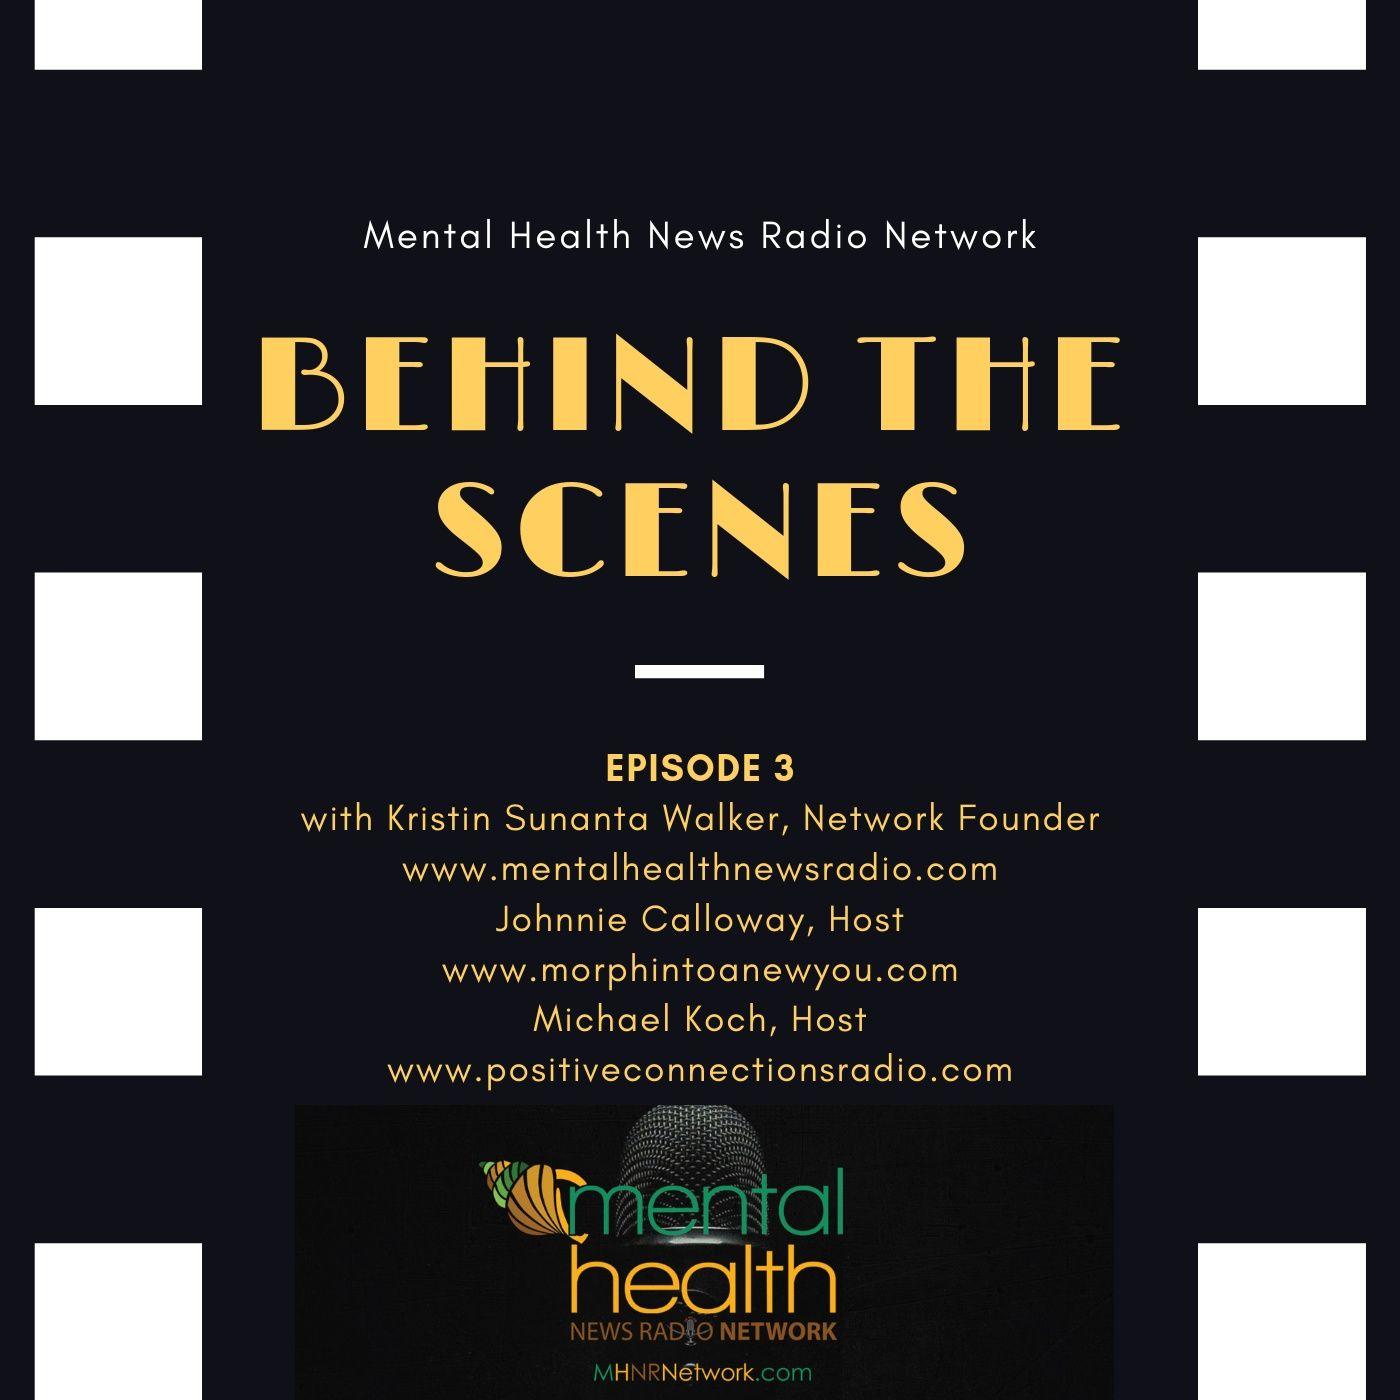 Mental Health News Radio - Behind The Scenes: Episode 3